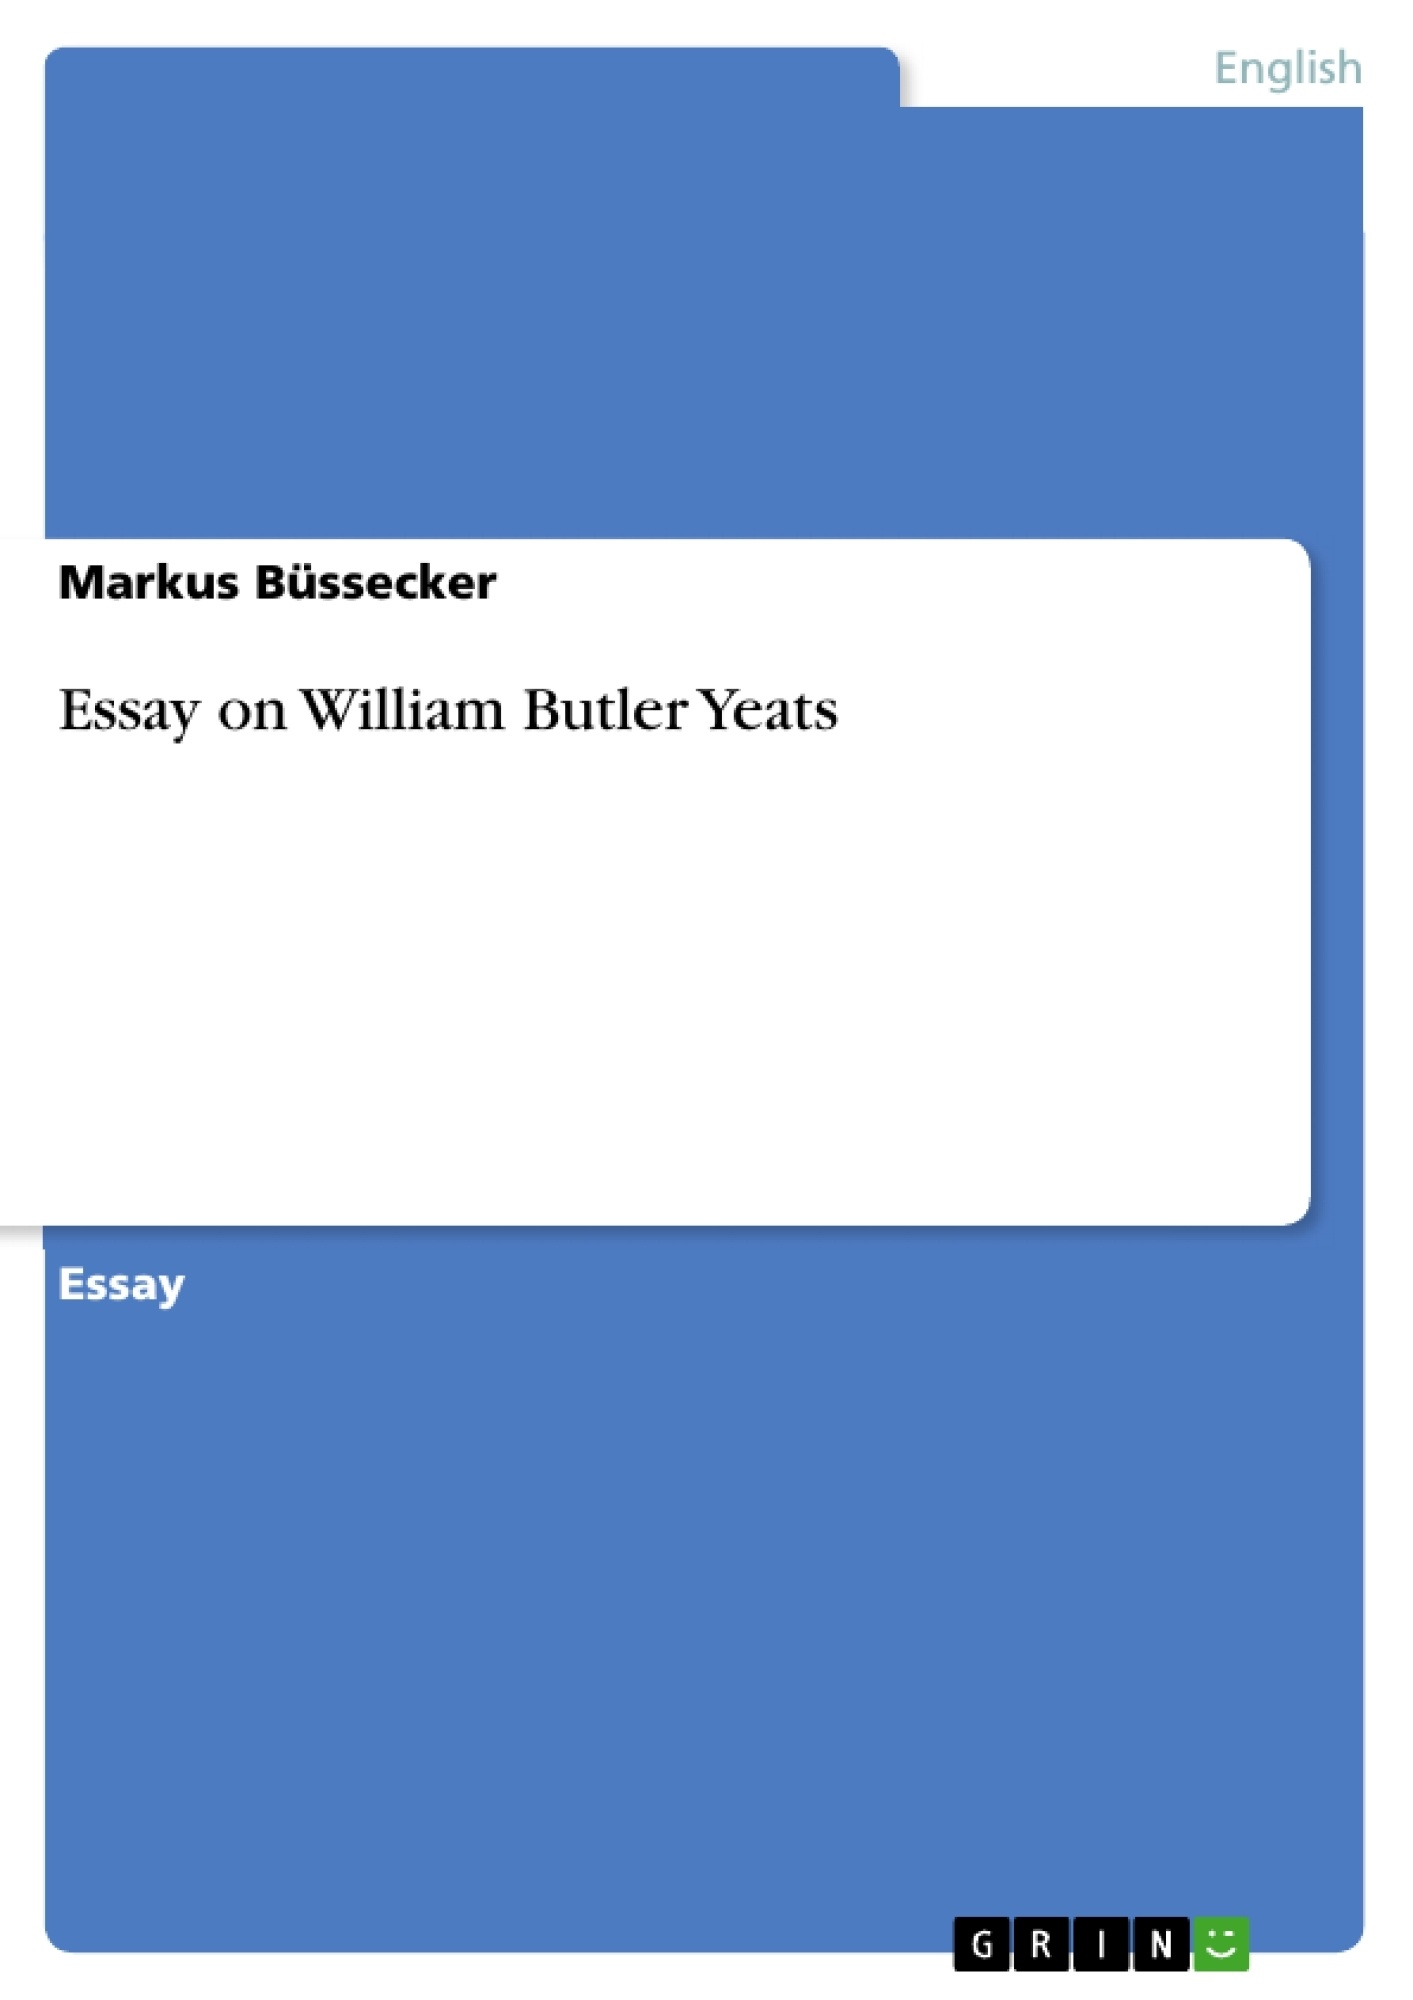 Title: Essay on William Butler Yeats